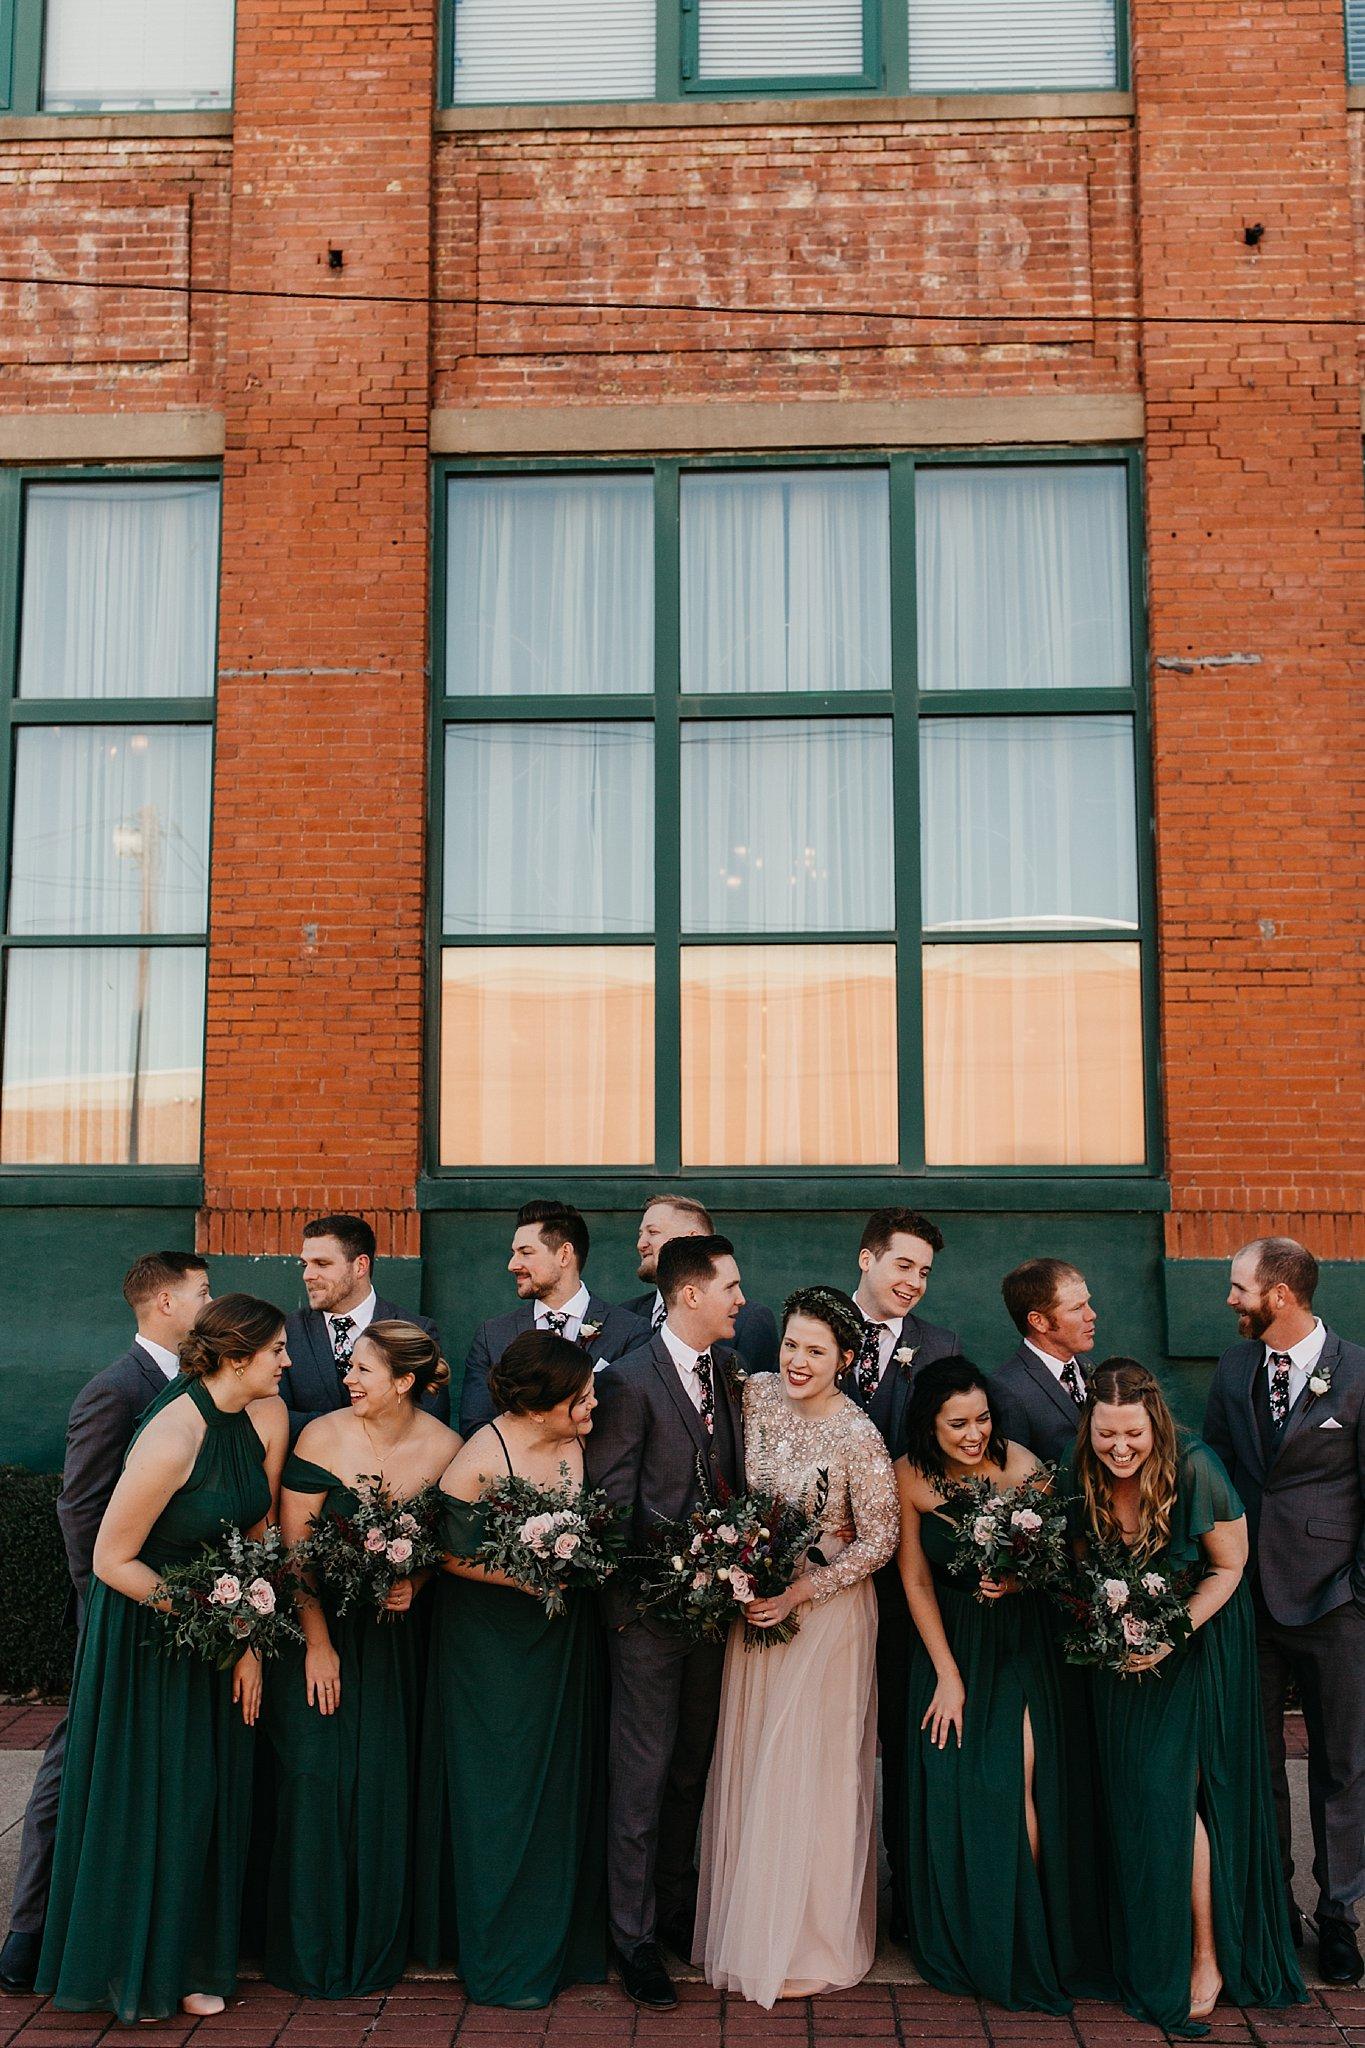 Wilderlove Co_Waco Texas_The Phoenix_Romantic Wedding Photography_0041.jpg